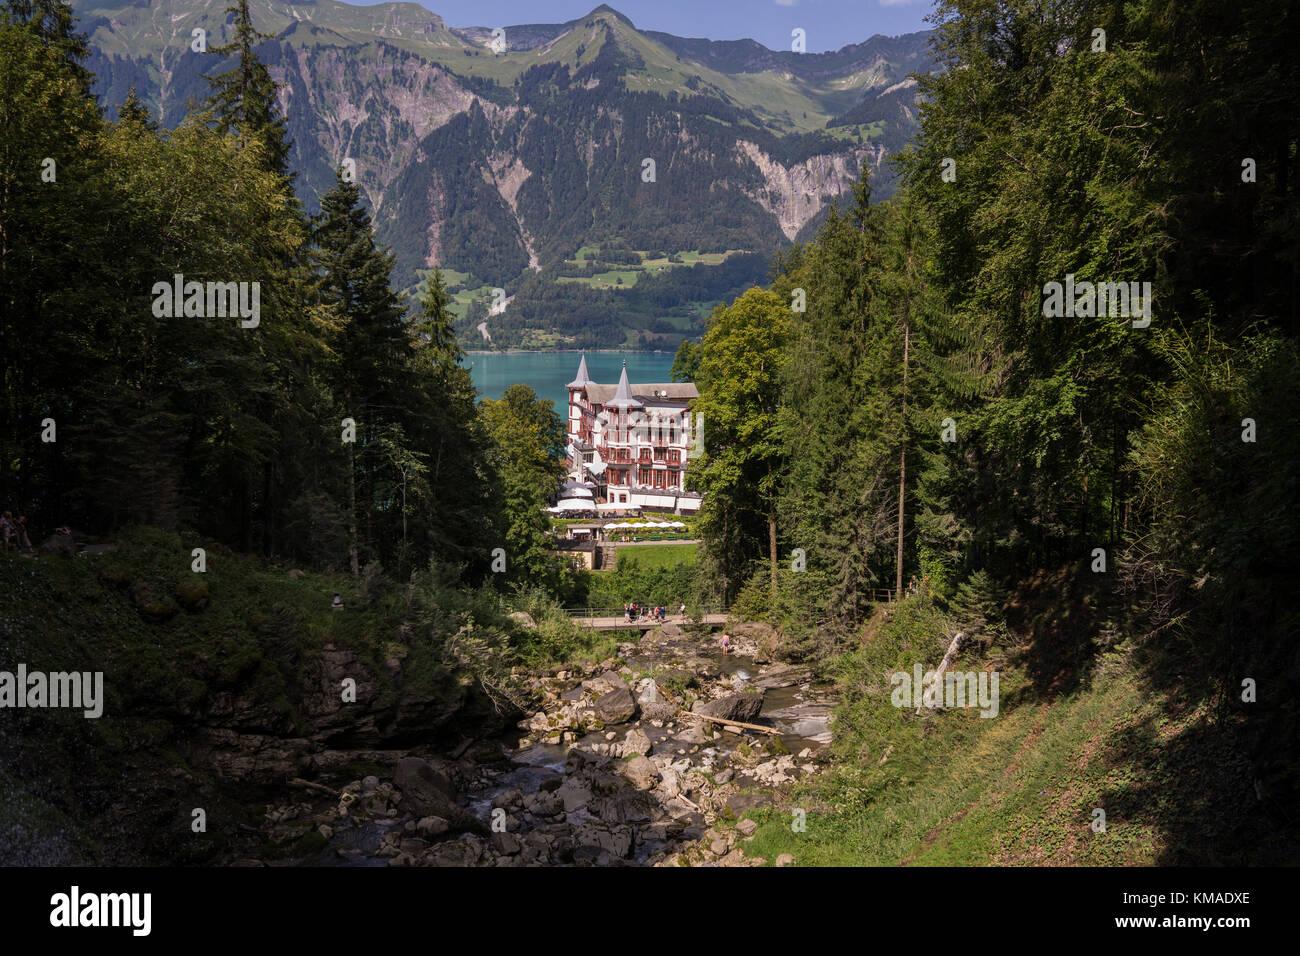 Grandhotel Giessbach, Schweiz Stockfoto